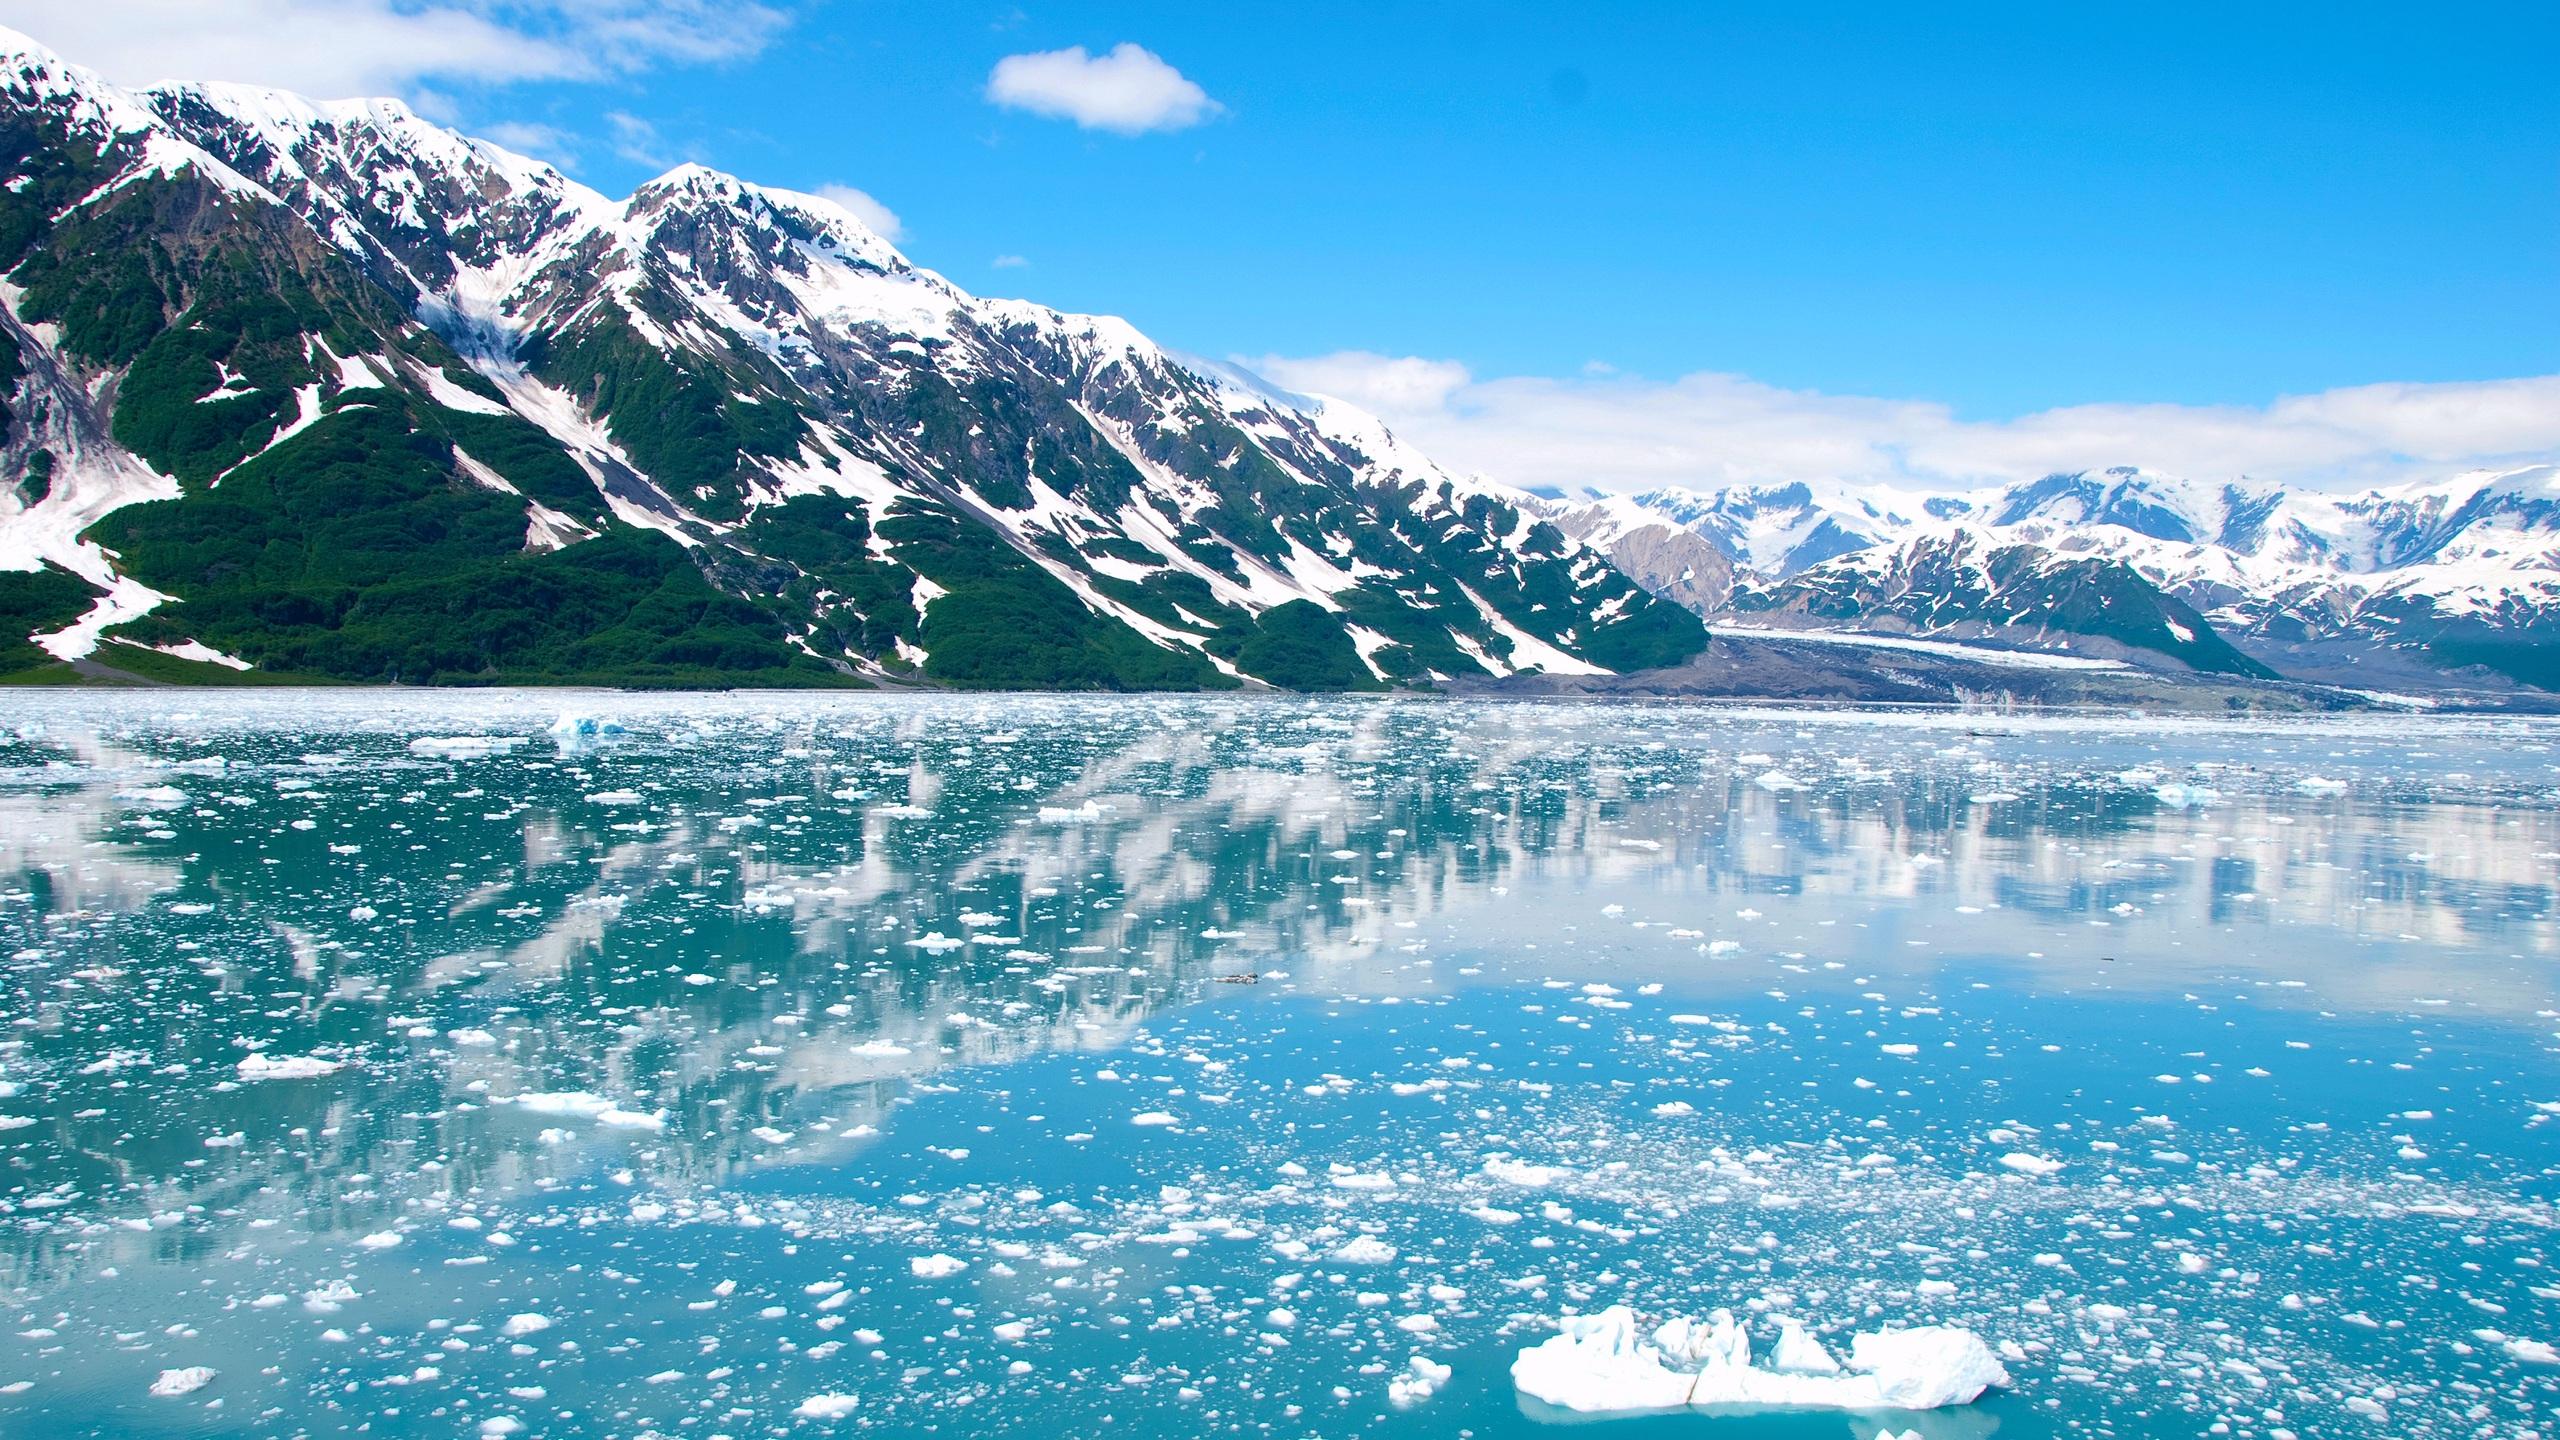 Beautiful Wallpaper Mountain 1440p - alaska-glacier-ice-mountains-xy-2560x1440  Best Photo Reference_29330.jpg